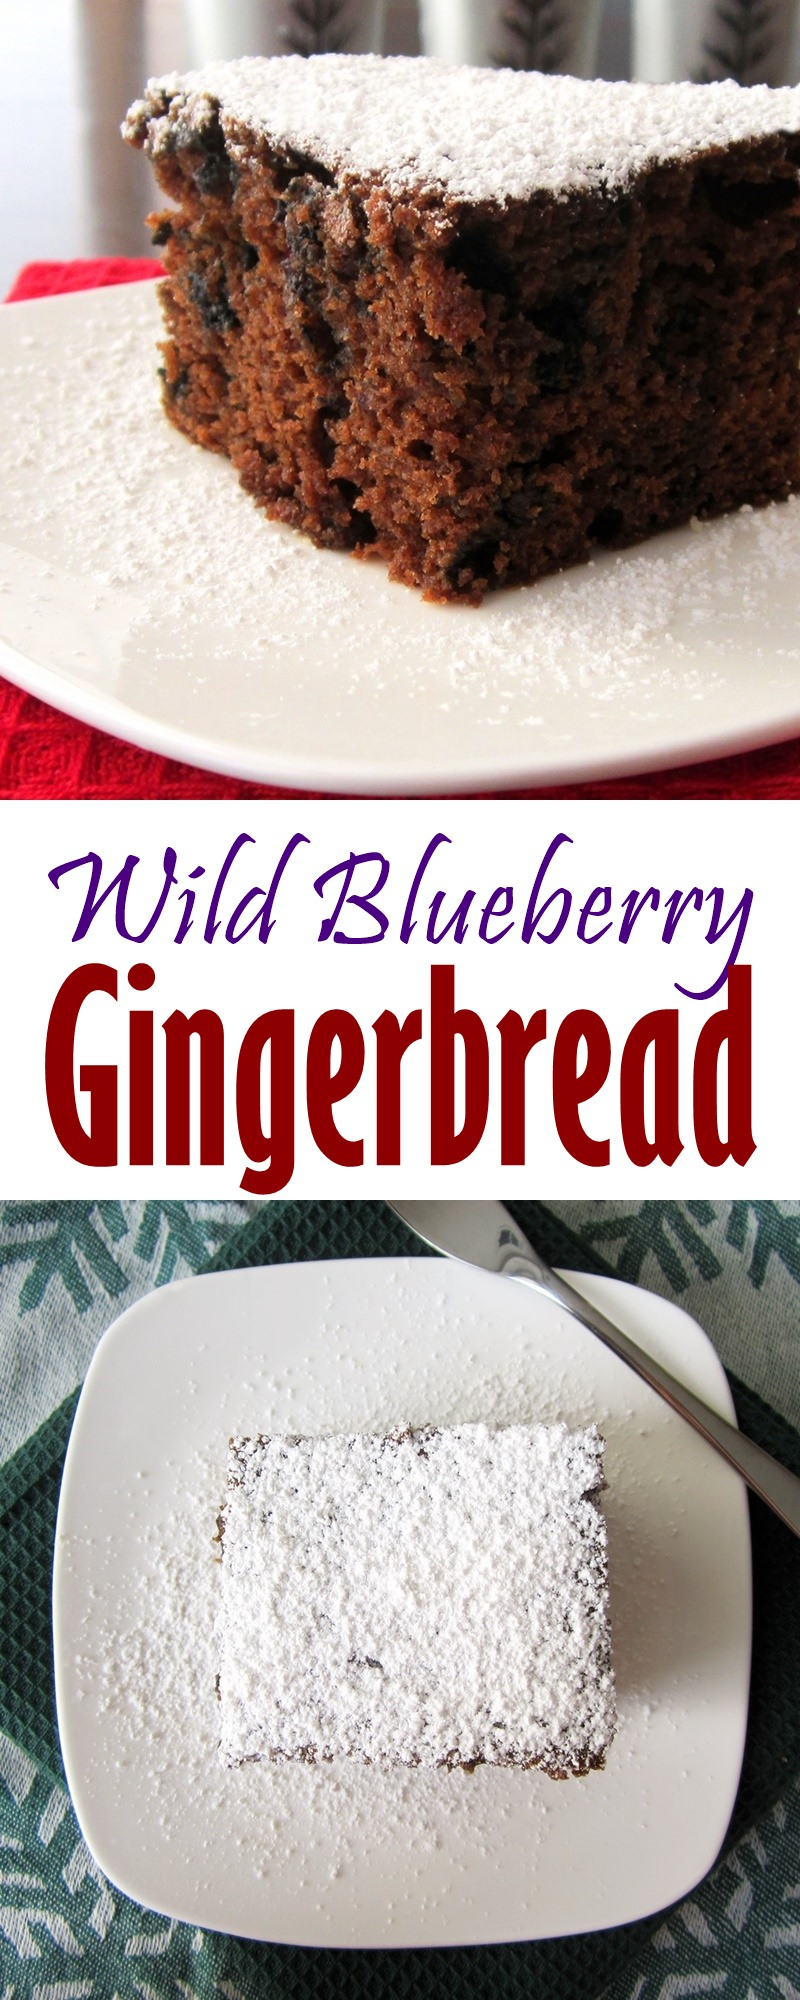 Wild Blueberry Gingerbread Recipe (dairy-free)